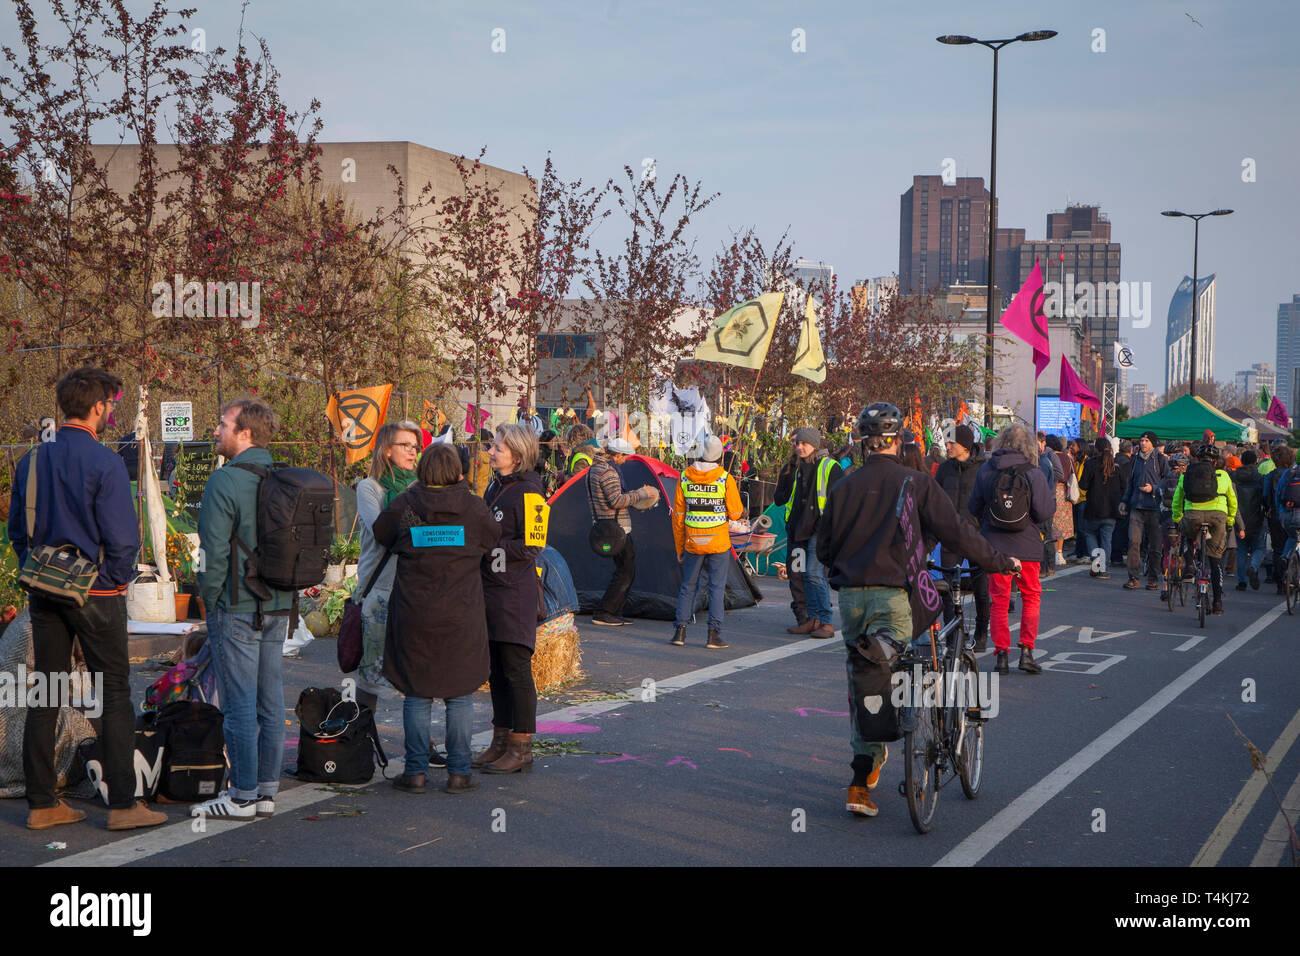 Protestors gather on Waterloo Bridge for the Extinction Rebellion demonstration - Stock Image